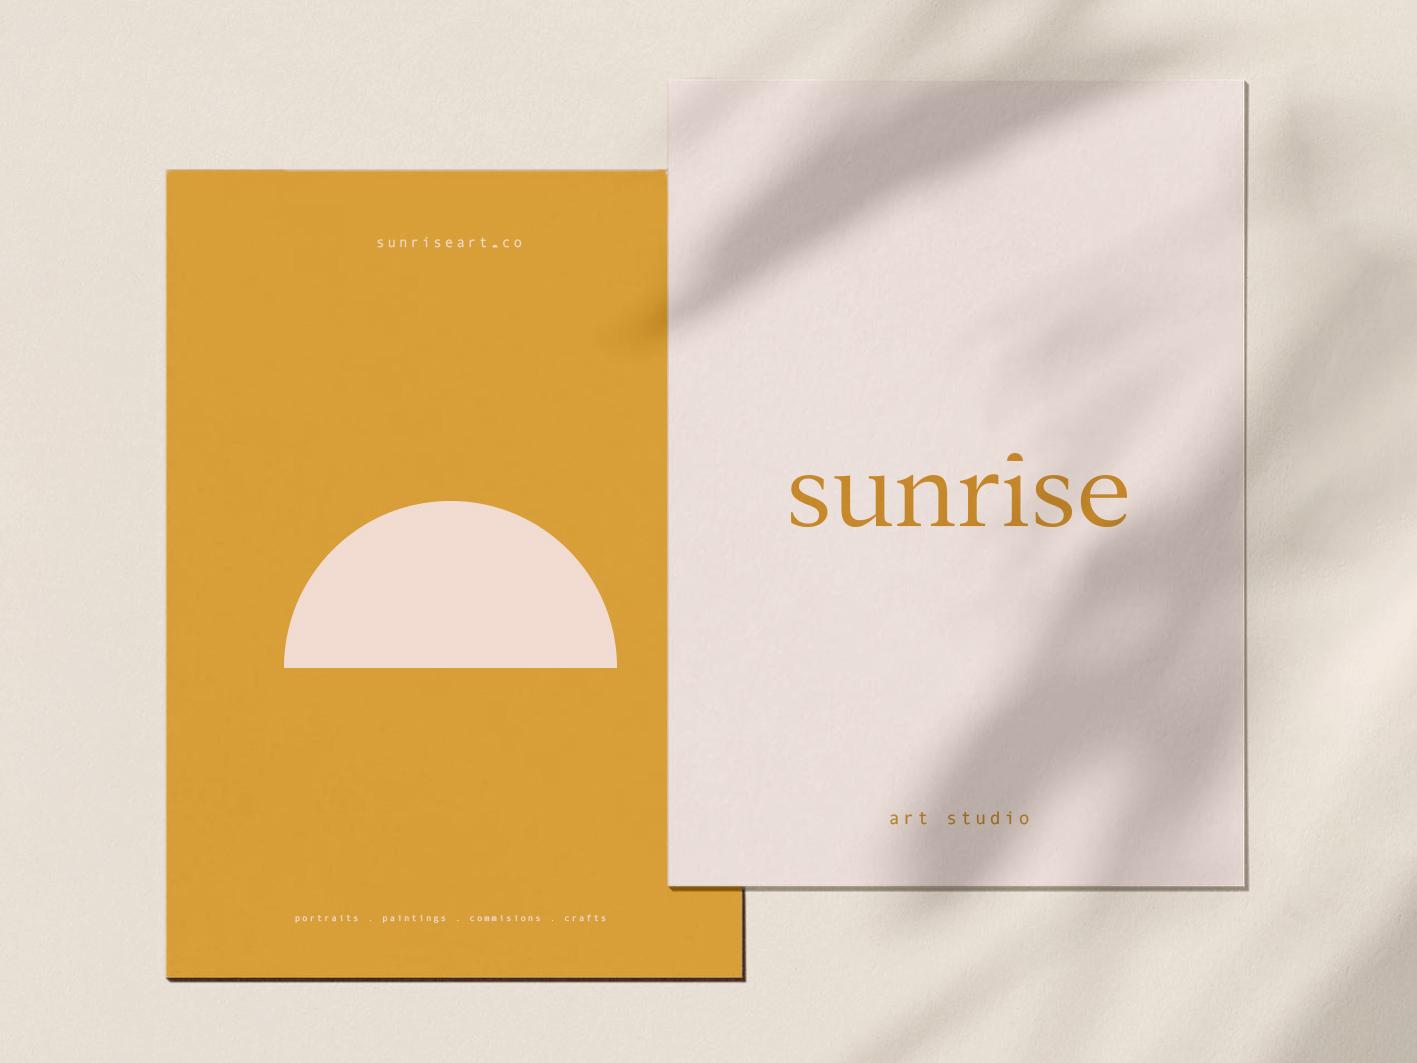 Sunrise Brand Design icon symbol minimal minimalism artist branding art studio summer sushine sun sunrise illustration cleverlogo logomarks font simplicity logodesign typography logo design branding